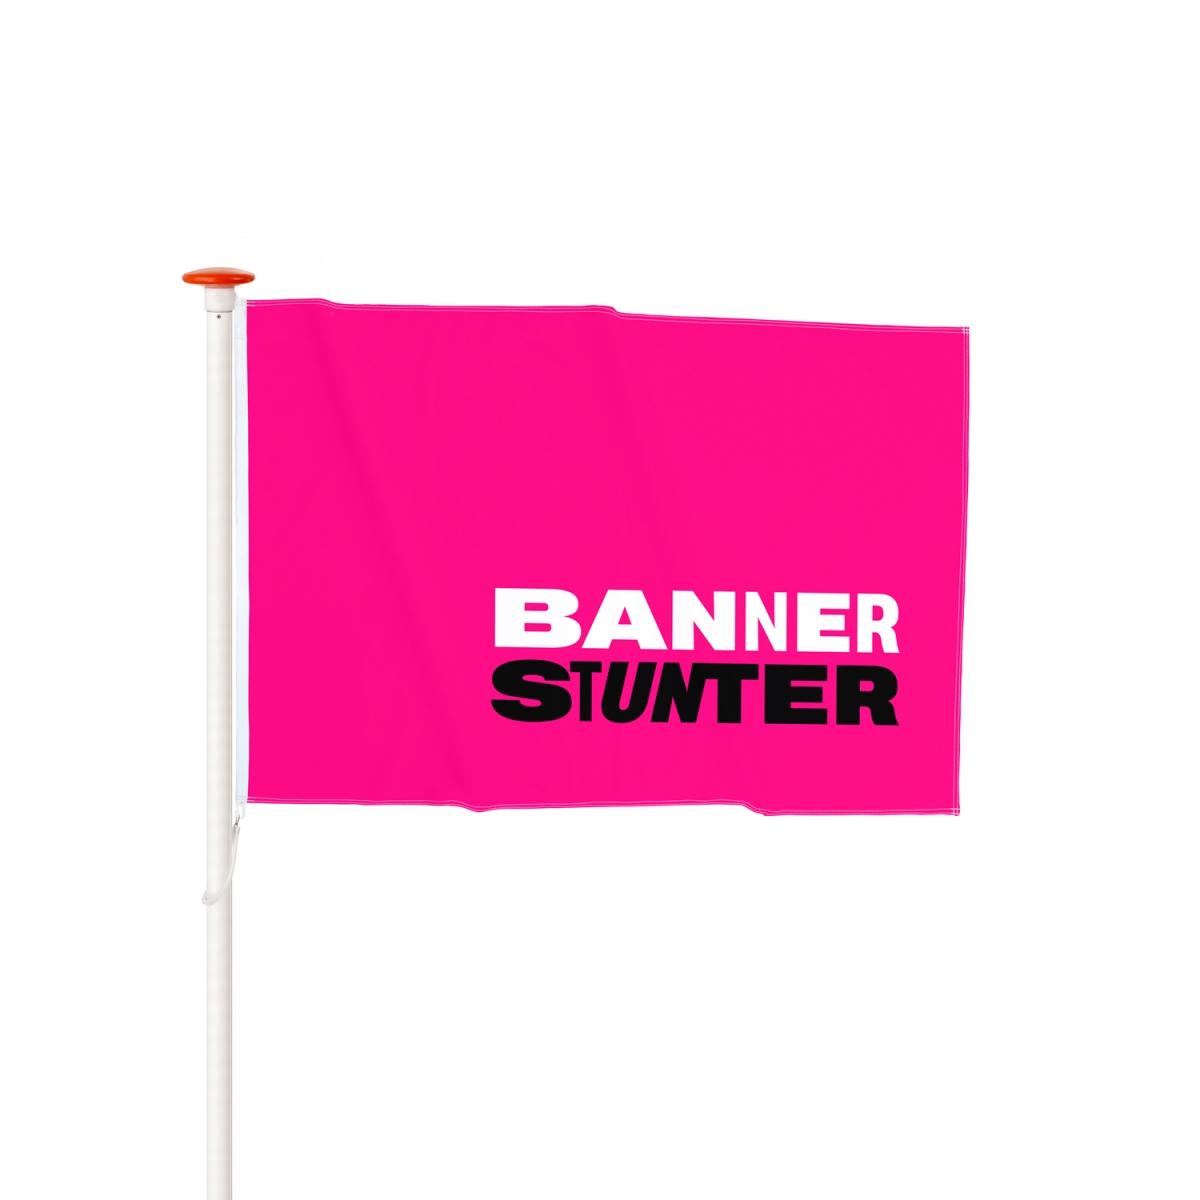 Rechte vlag XL 200 cm x 300 cm